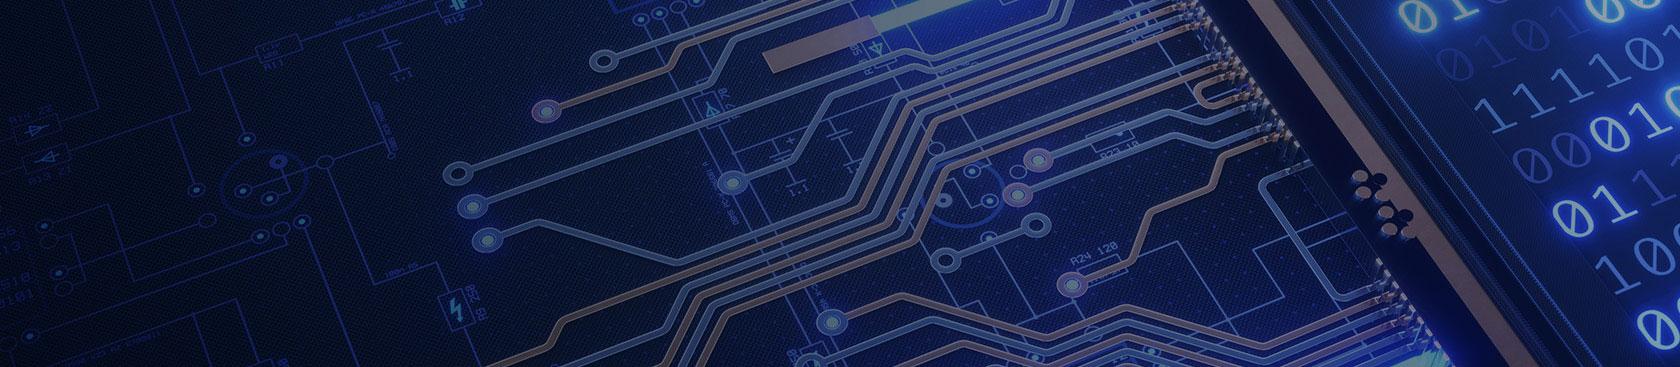 3-network-monitoring-fails